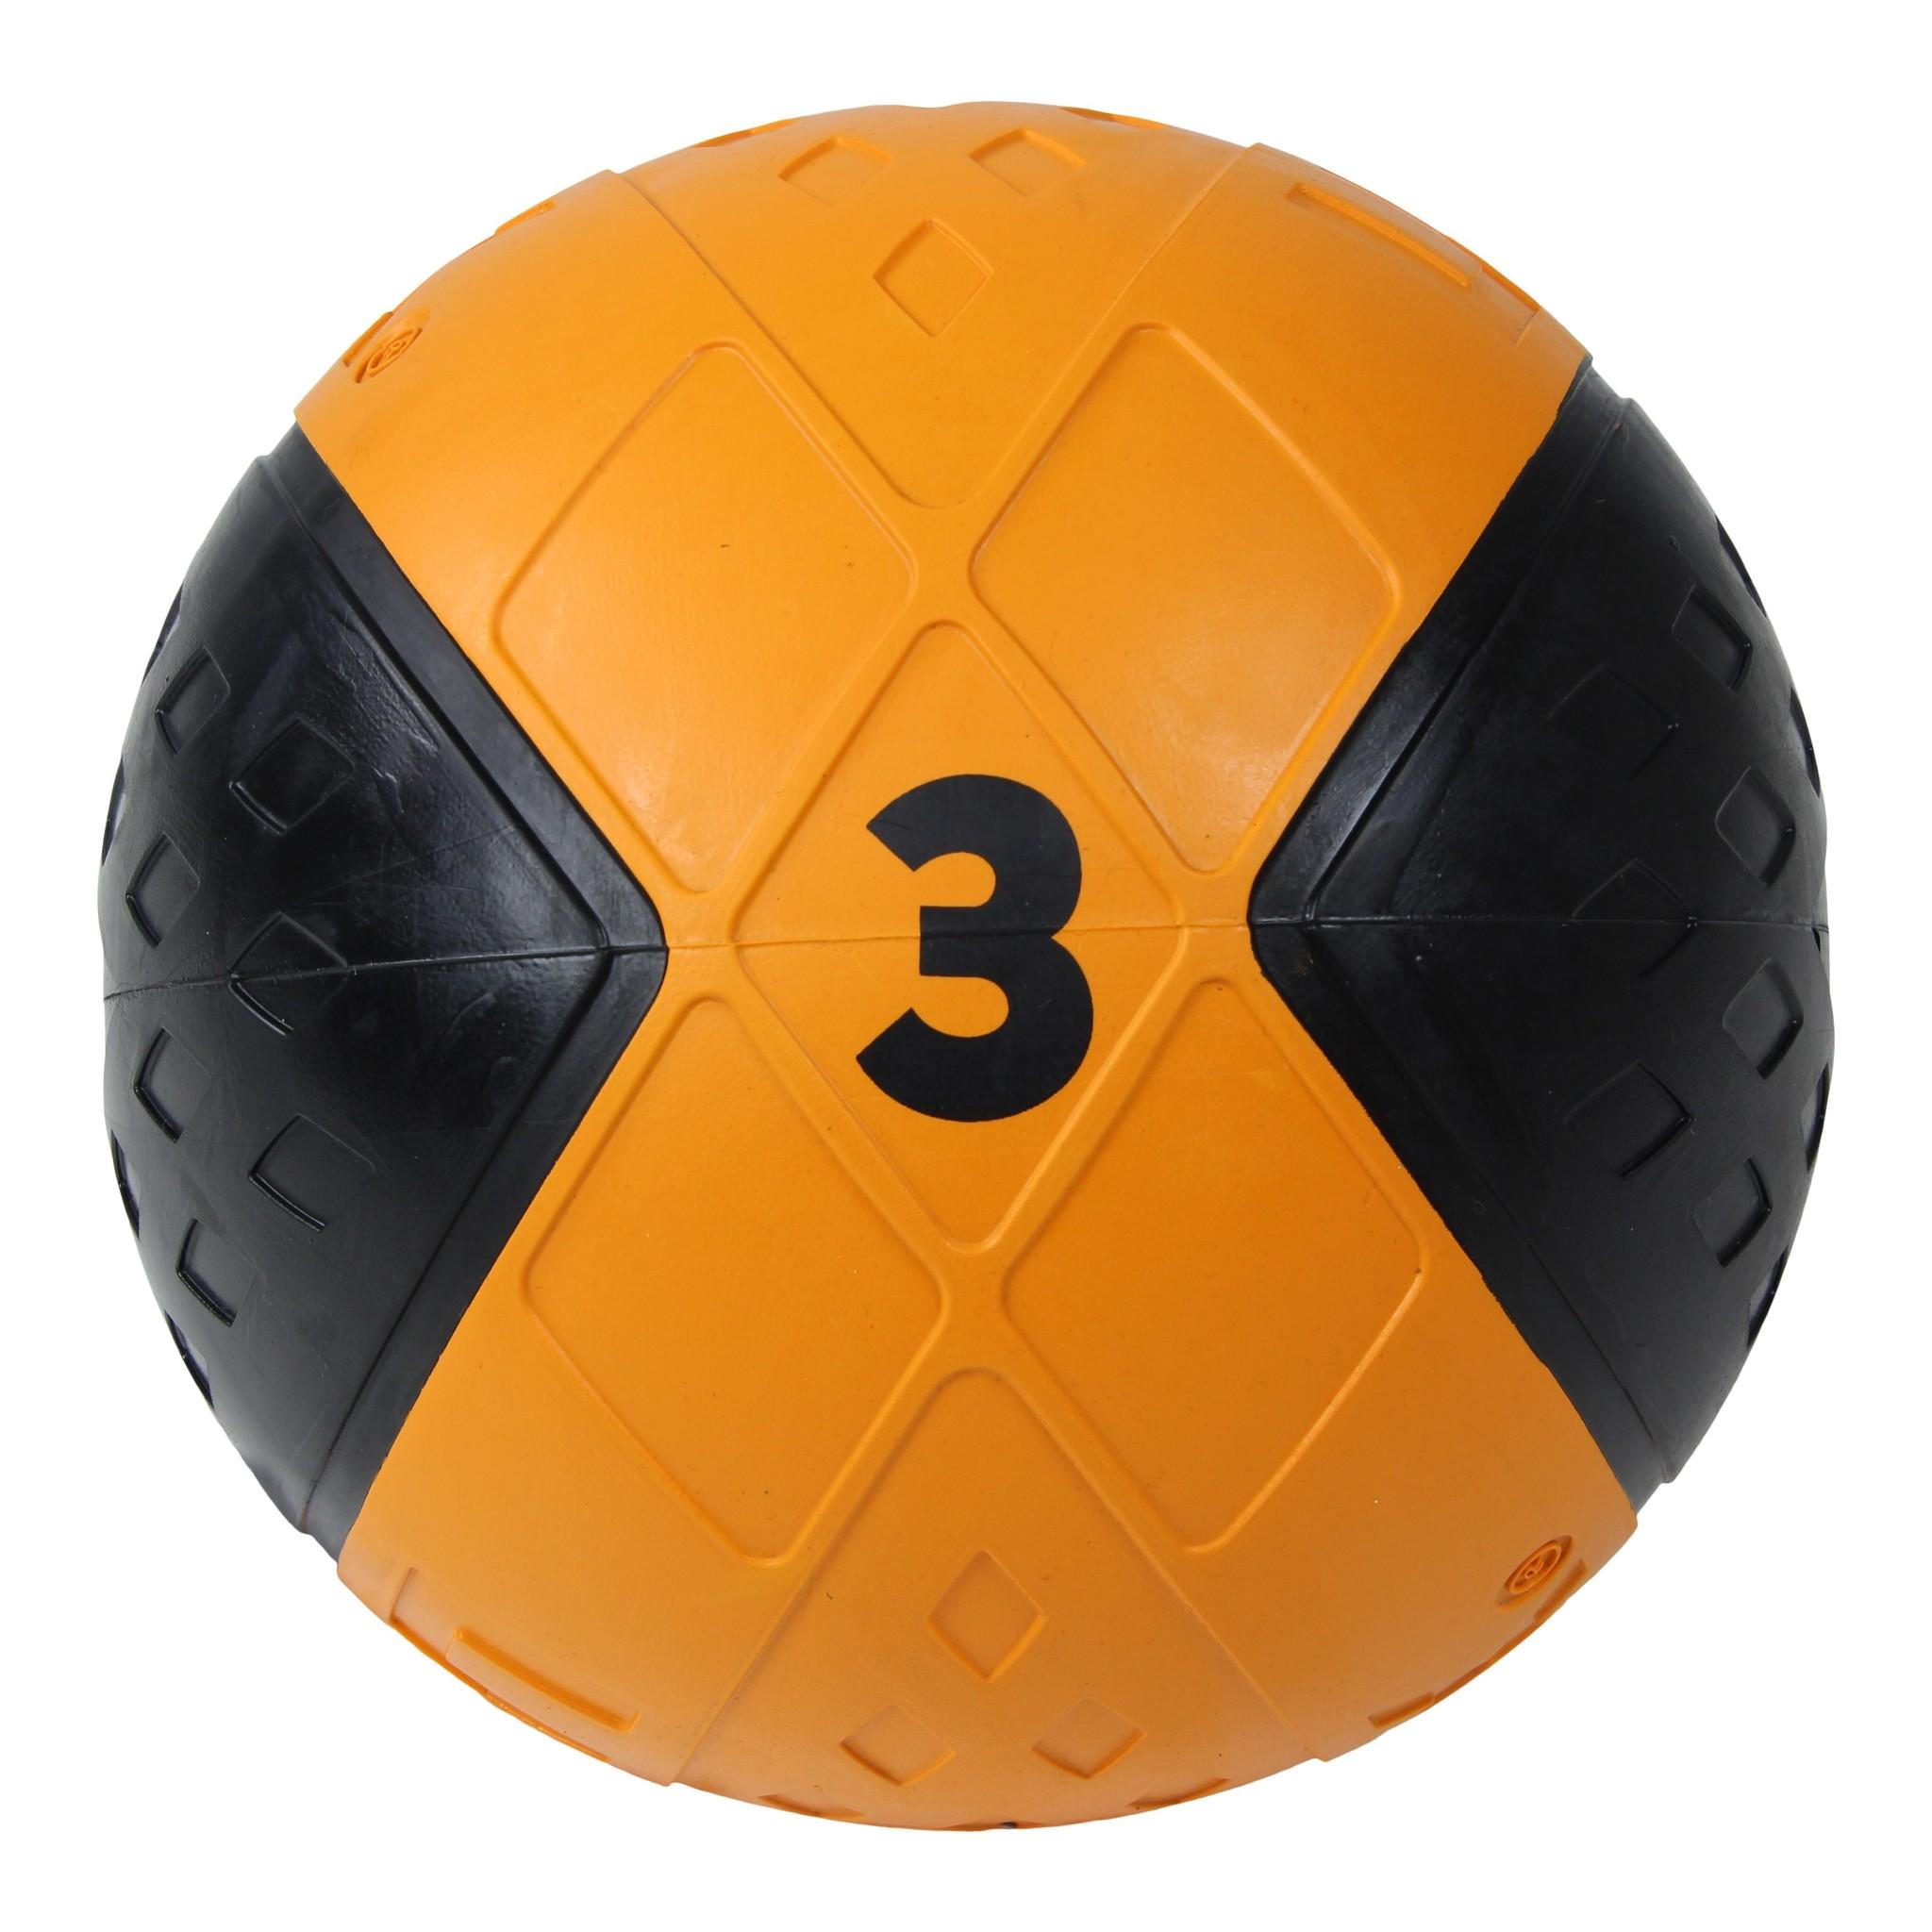 LMX. Medicinbold 5 kg